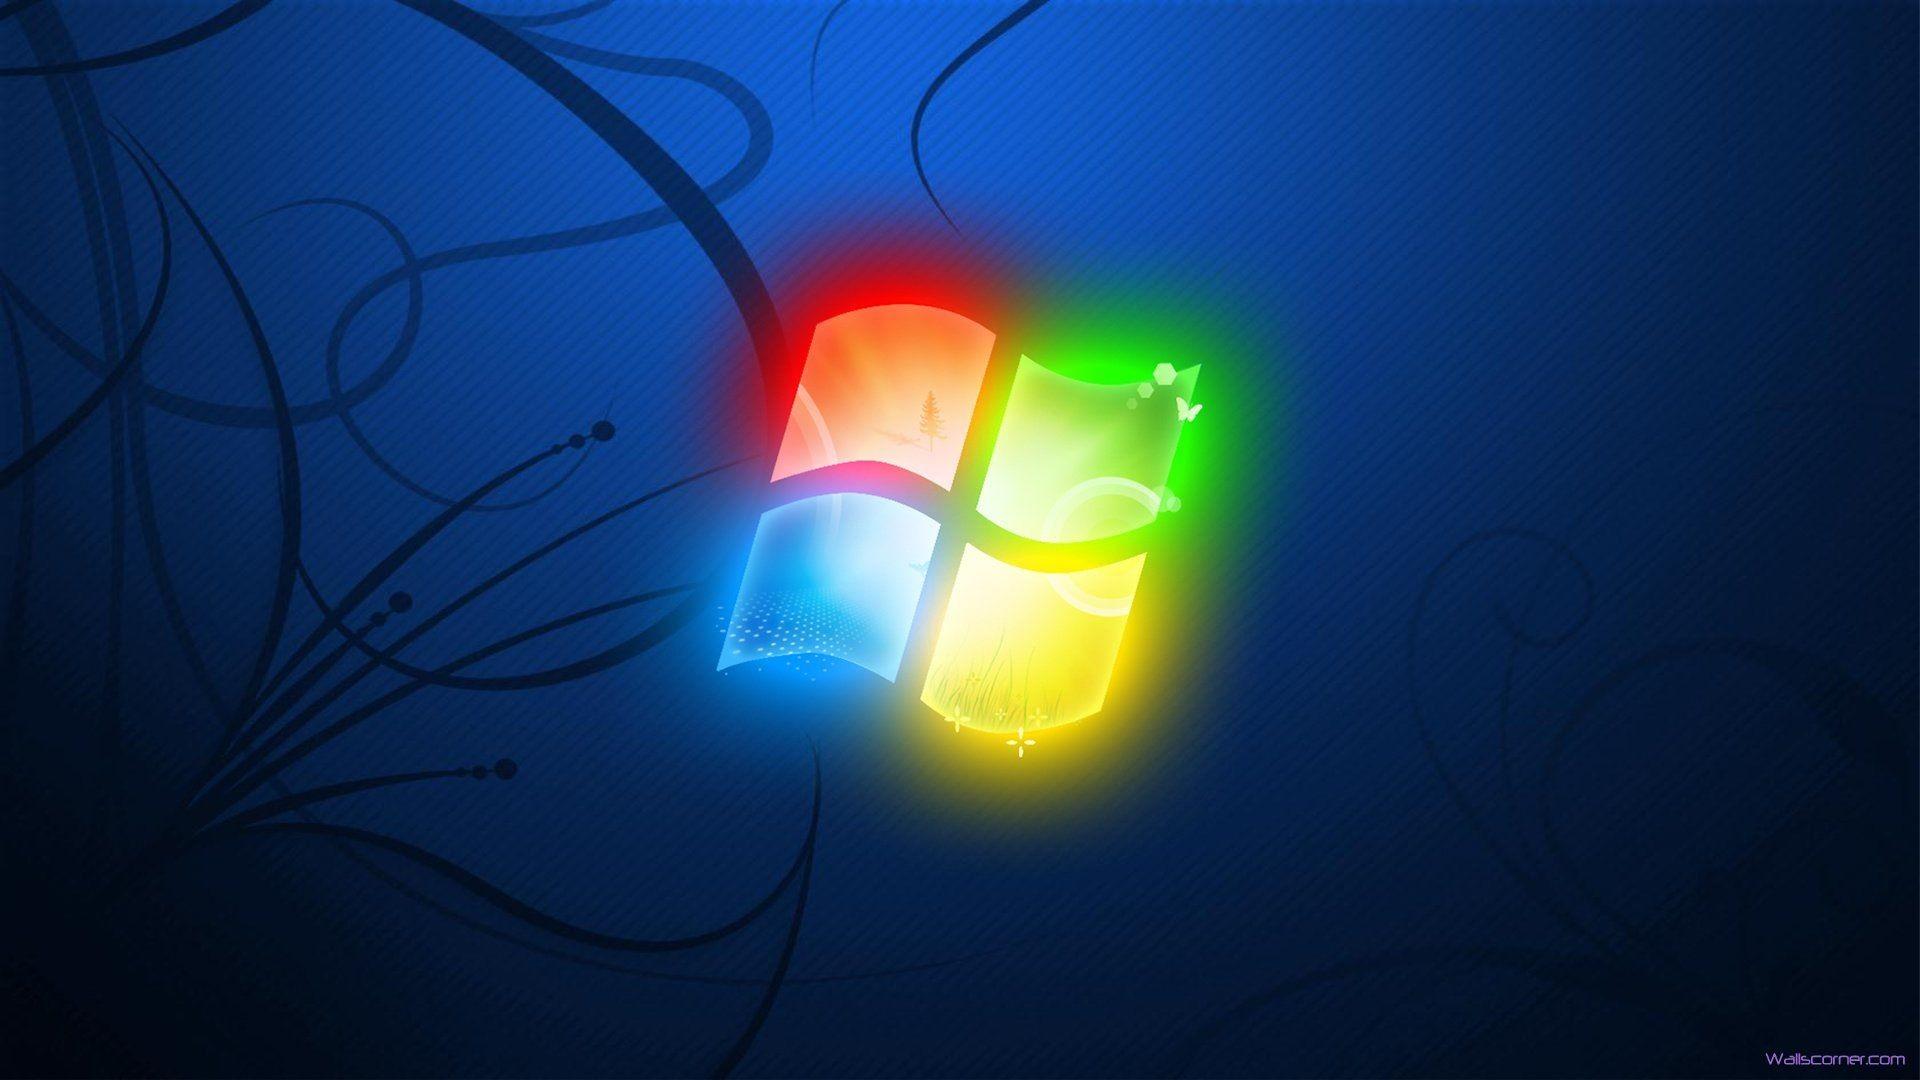 Full HD p Windows Wallpapers HD, Desktop Backgrounds HD Wallpapers For  Windows 7 Wallpapers)